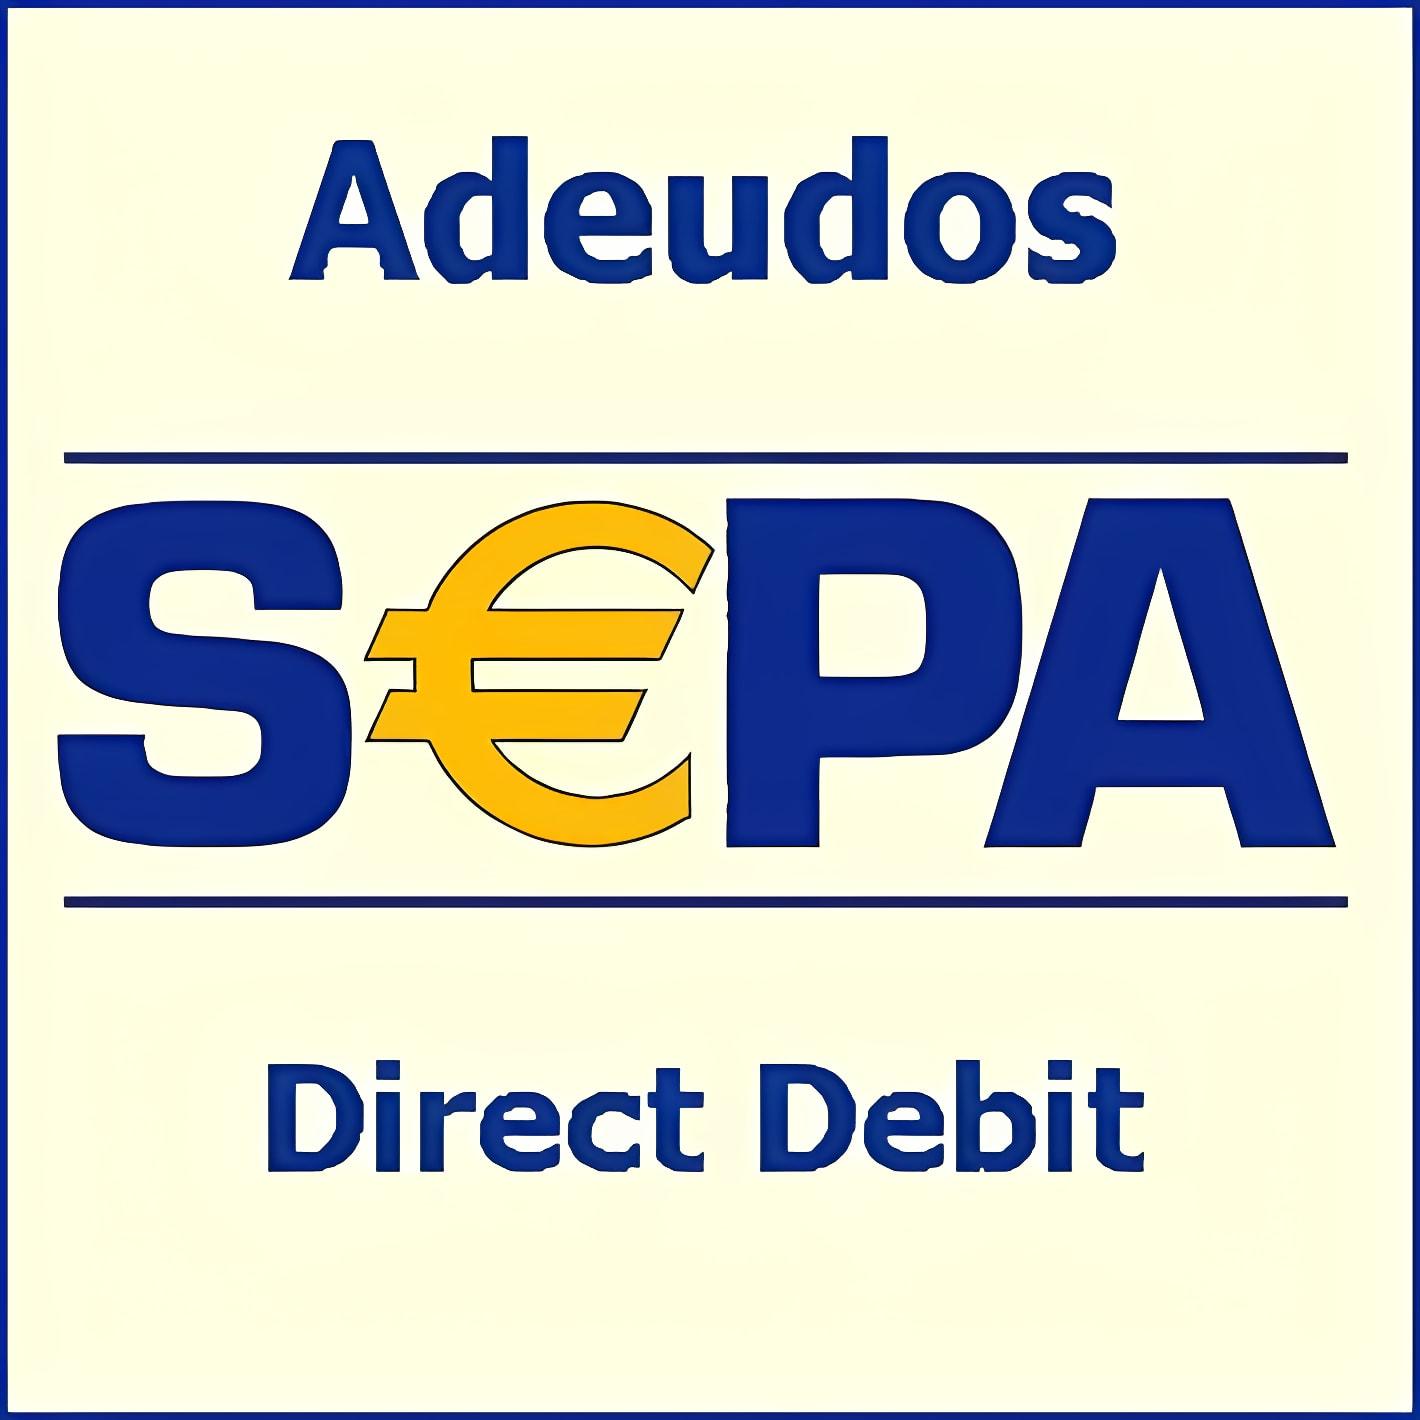 Adeudos SEPA (Sepa Direct Debit)